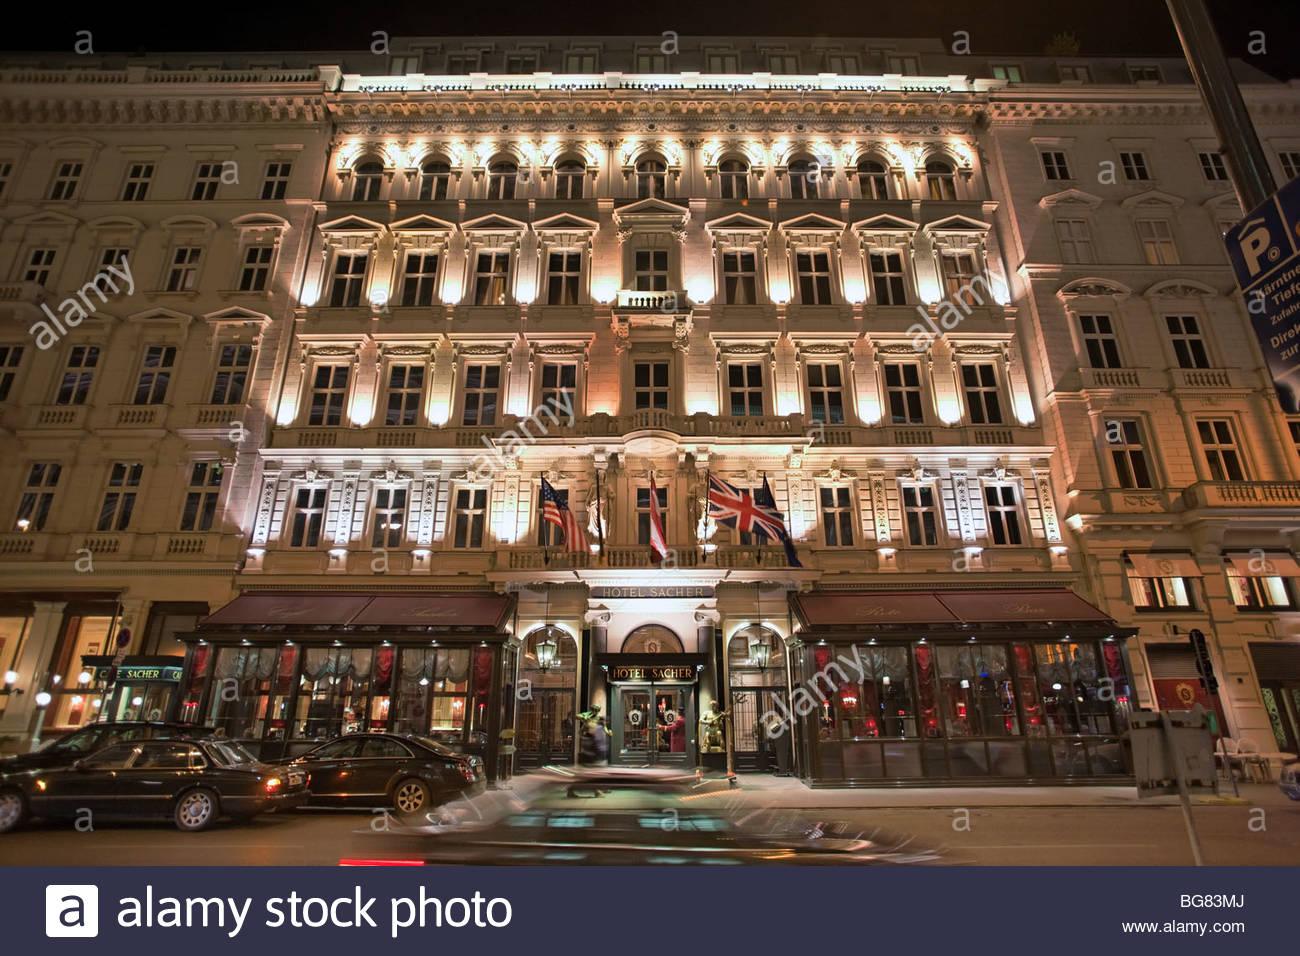 A O Hotel Wien